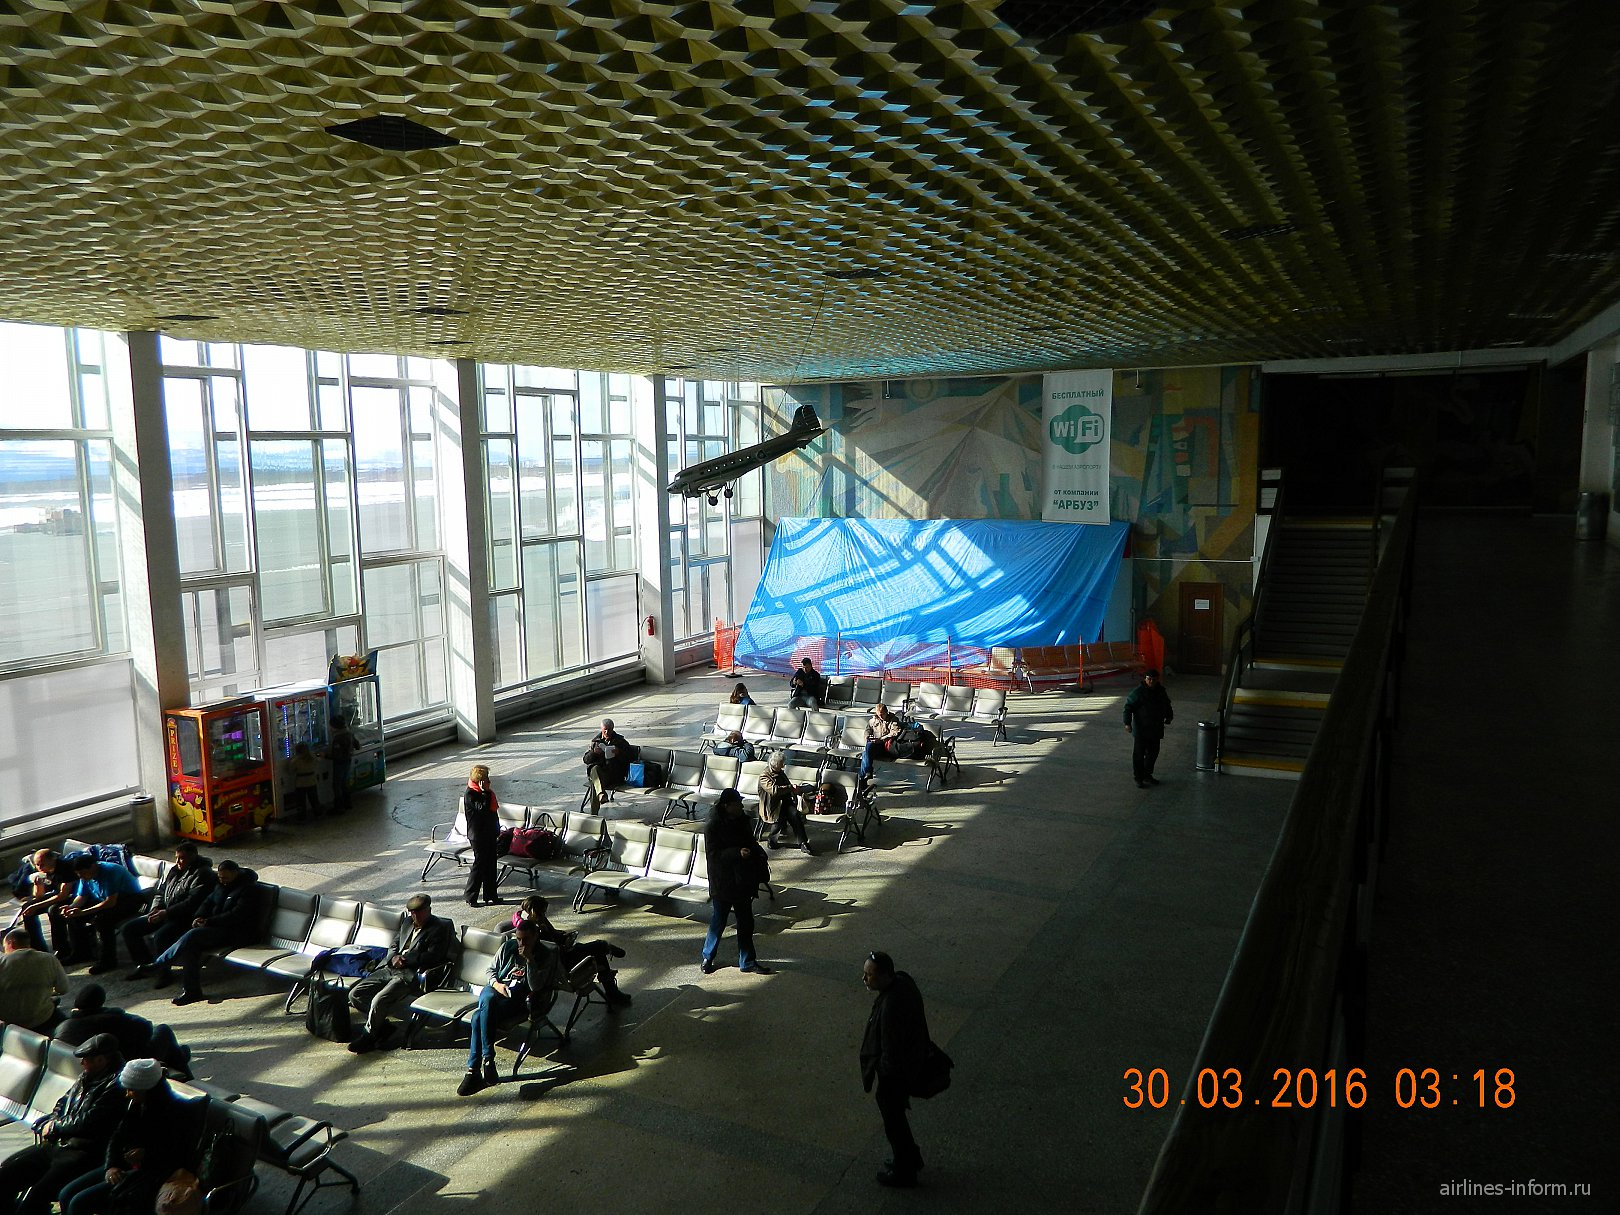 Зал ожидания в аэропорту Магадан Сокол